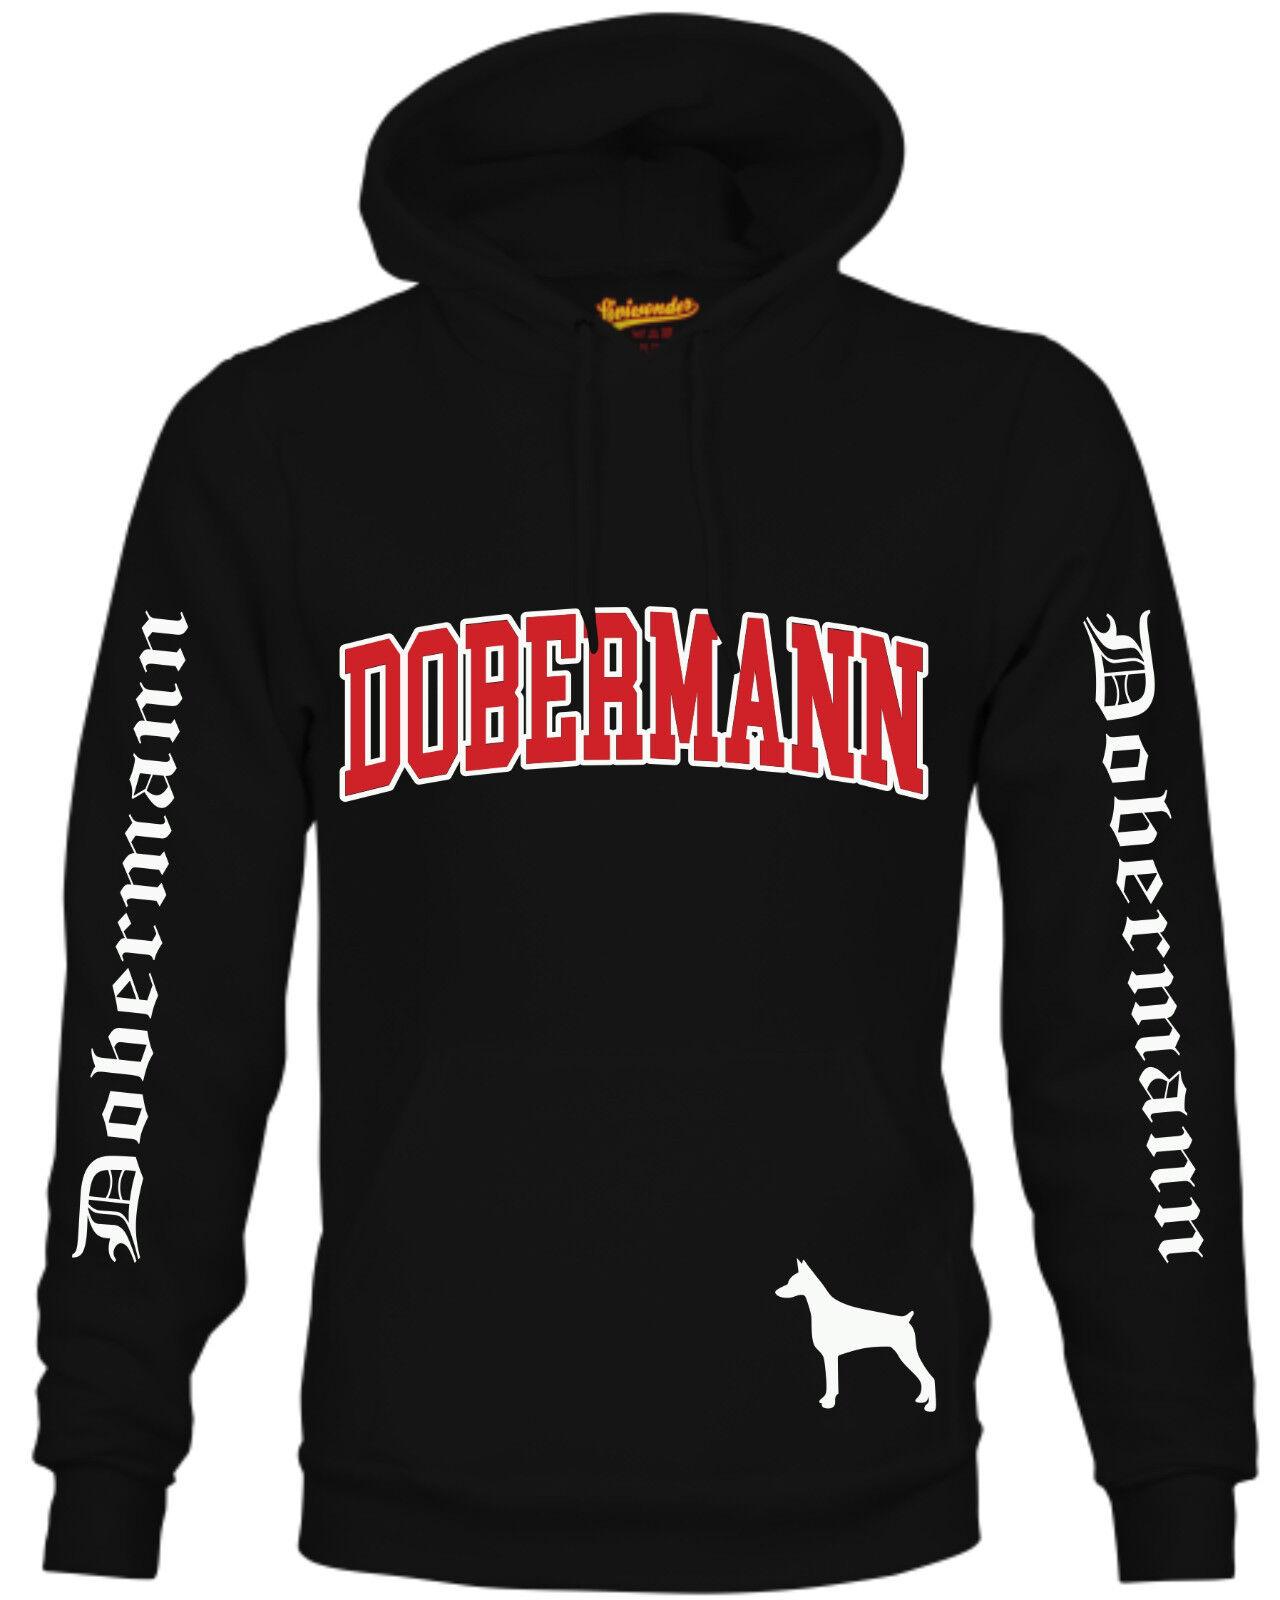 DOBERMANN - EXTREME Kapuze Hund Dobie Dobynm Pinscher Dobi Sweatshirt Siviwonder